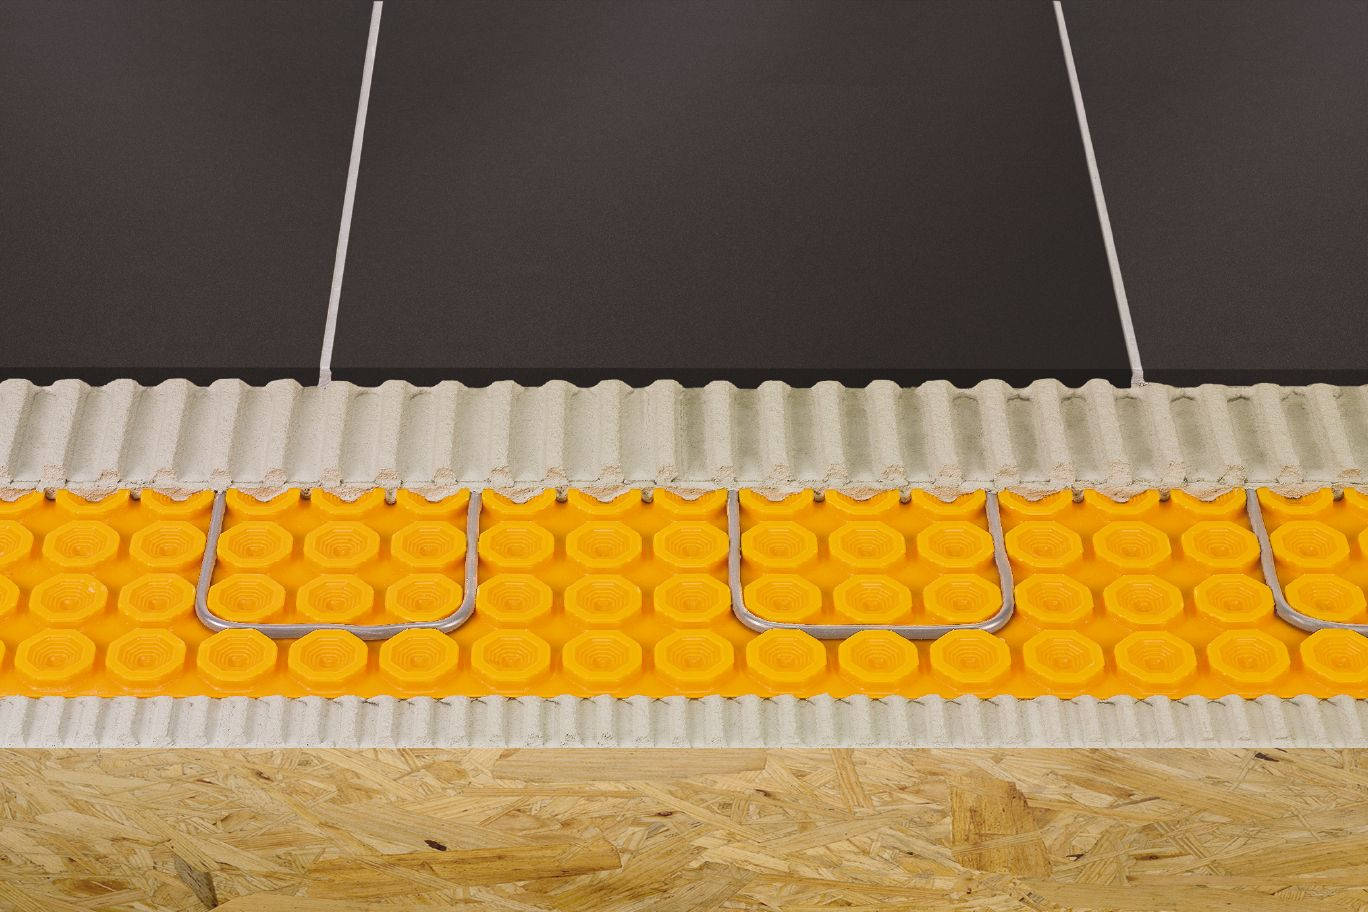 20 attractive Hardwood Floor Installation Calculator 2021 free download hardwood floor installation calculator of schlutera ditra heat floor warming schluter com in schlutera ditra heat